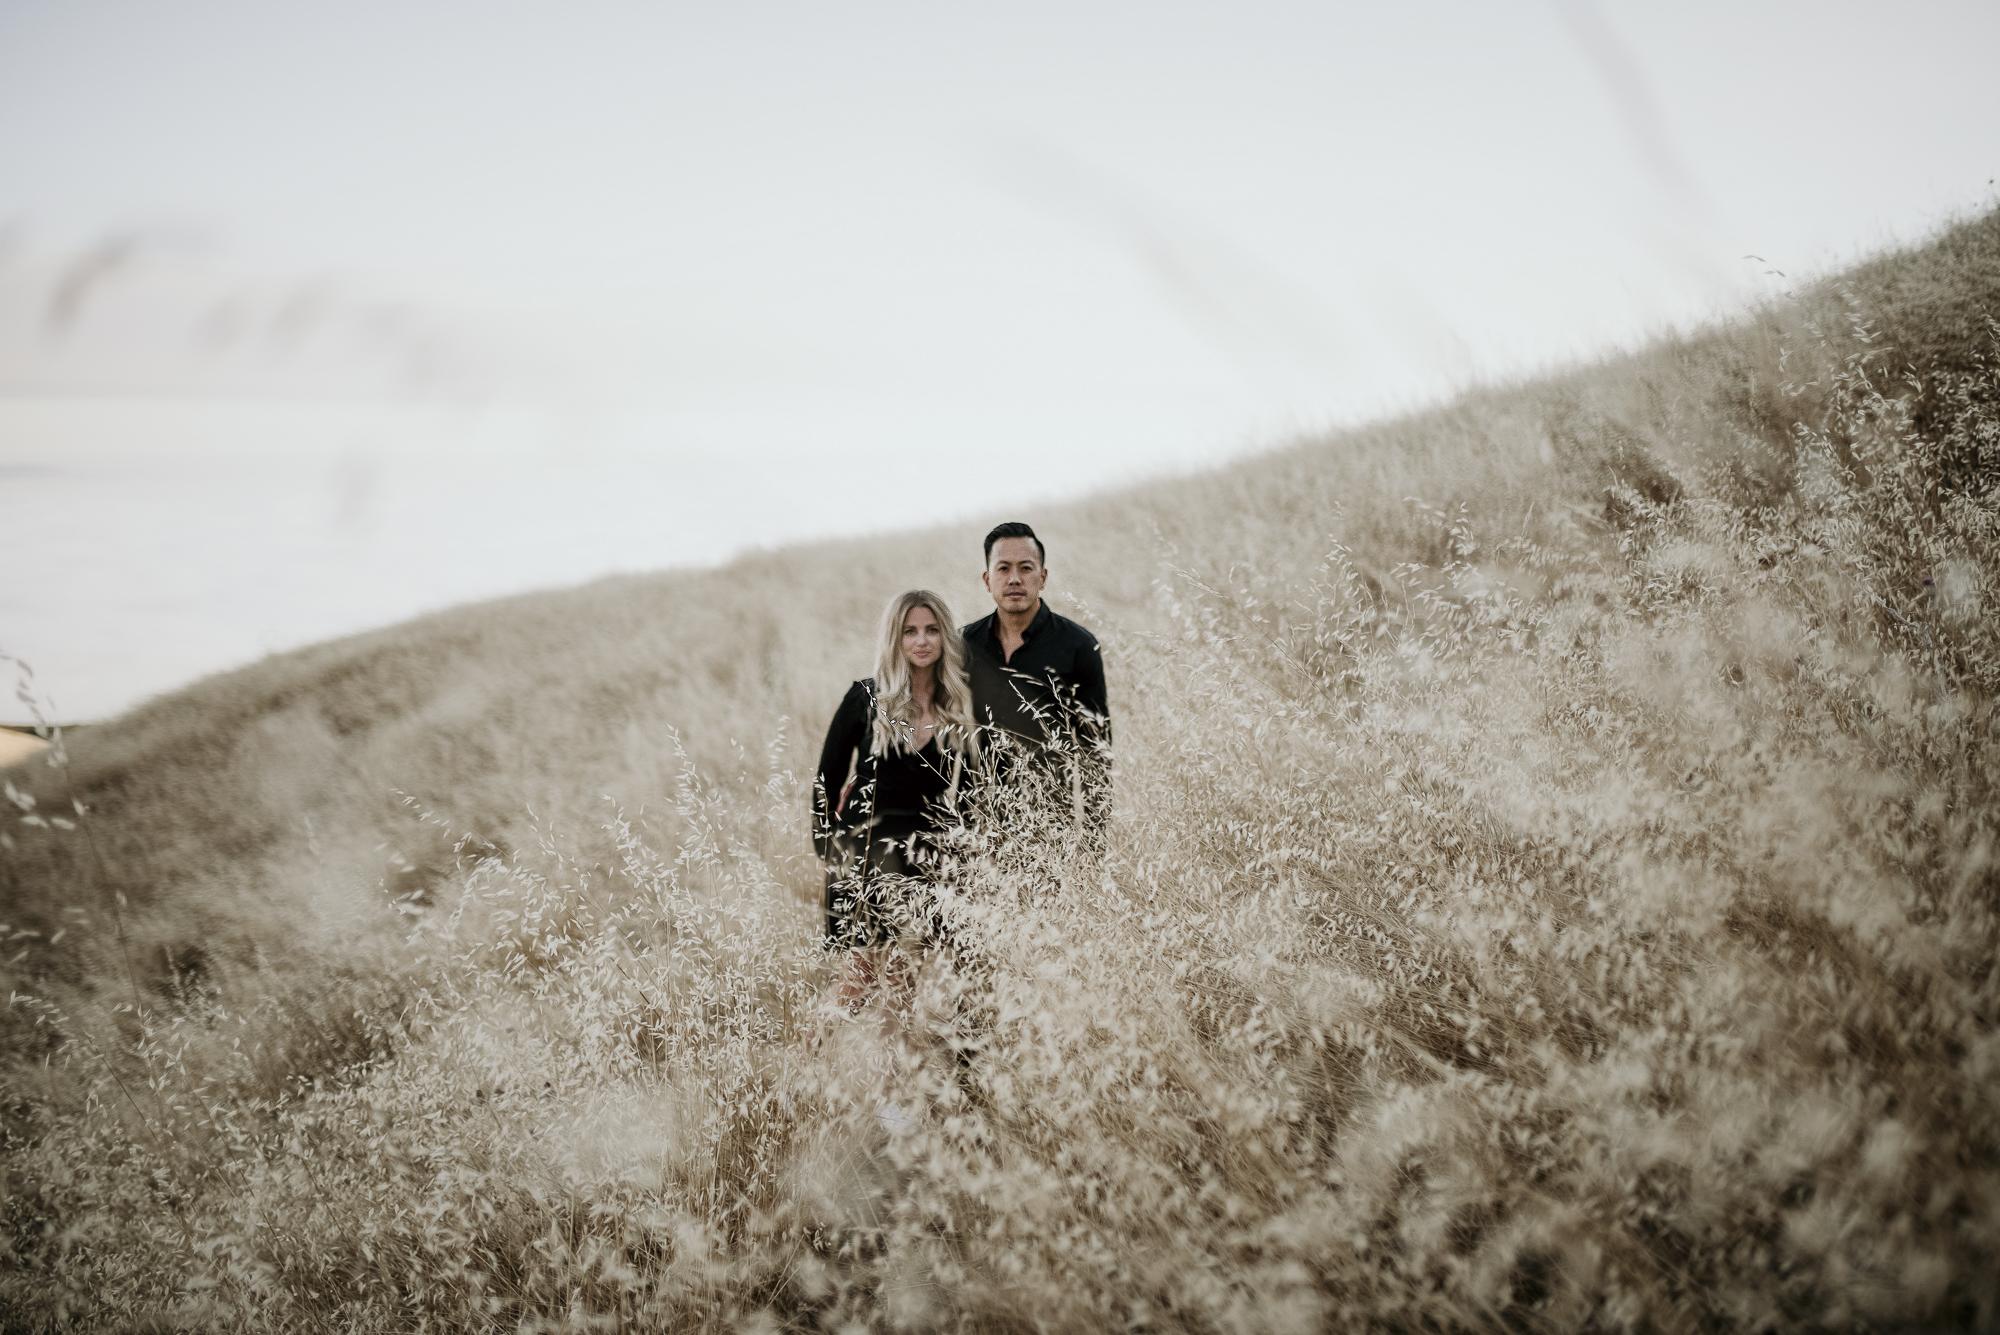 Megan + Jimmy - Mt. Tamalpais, California